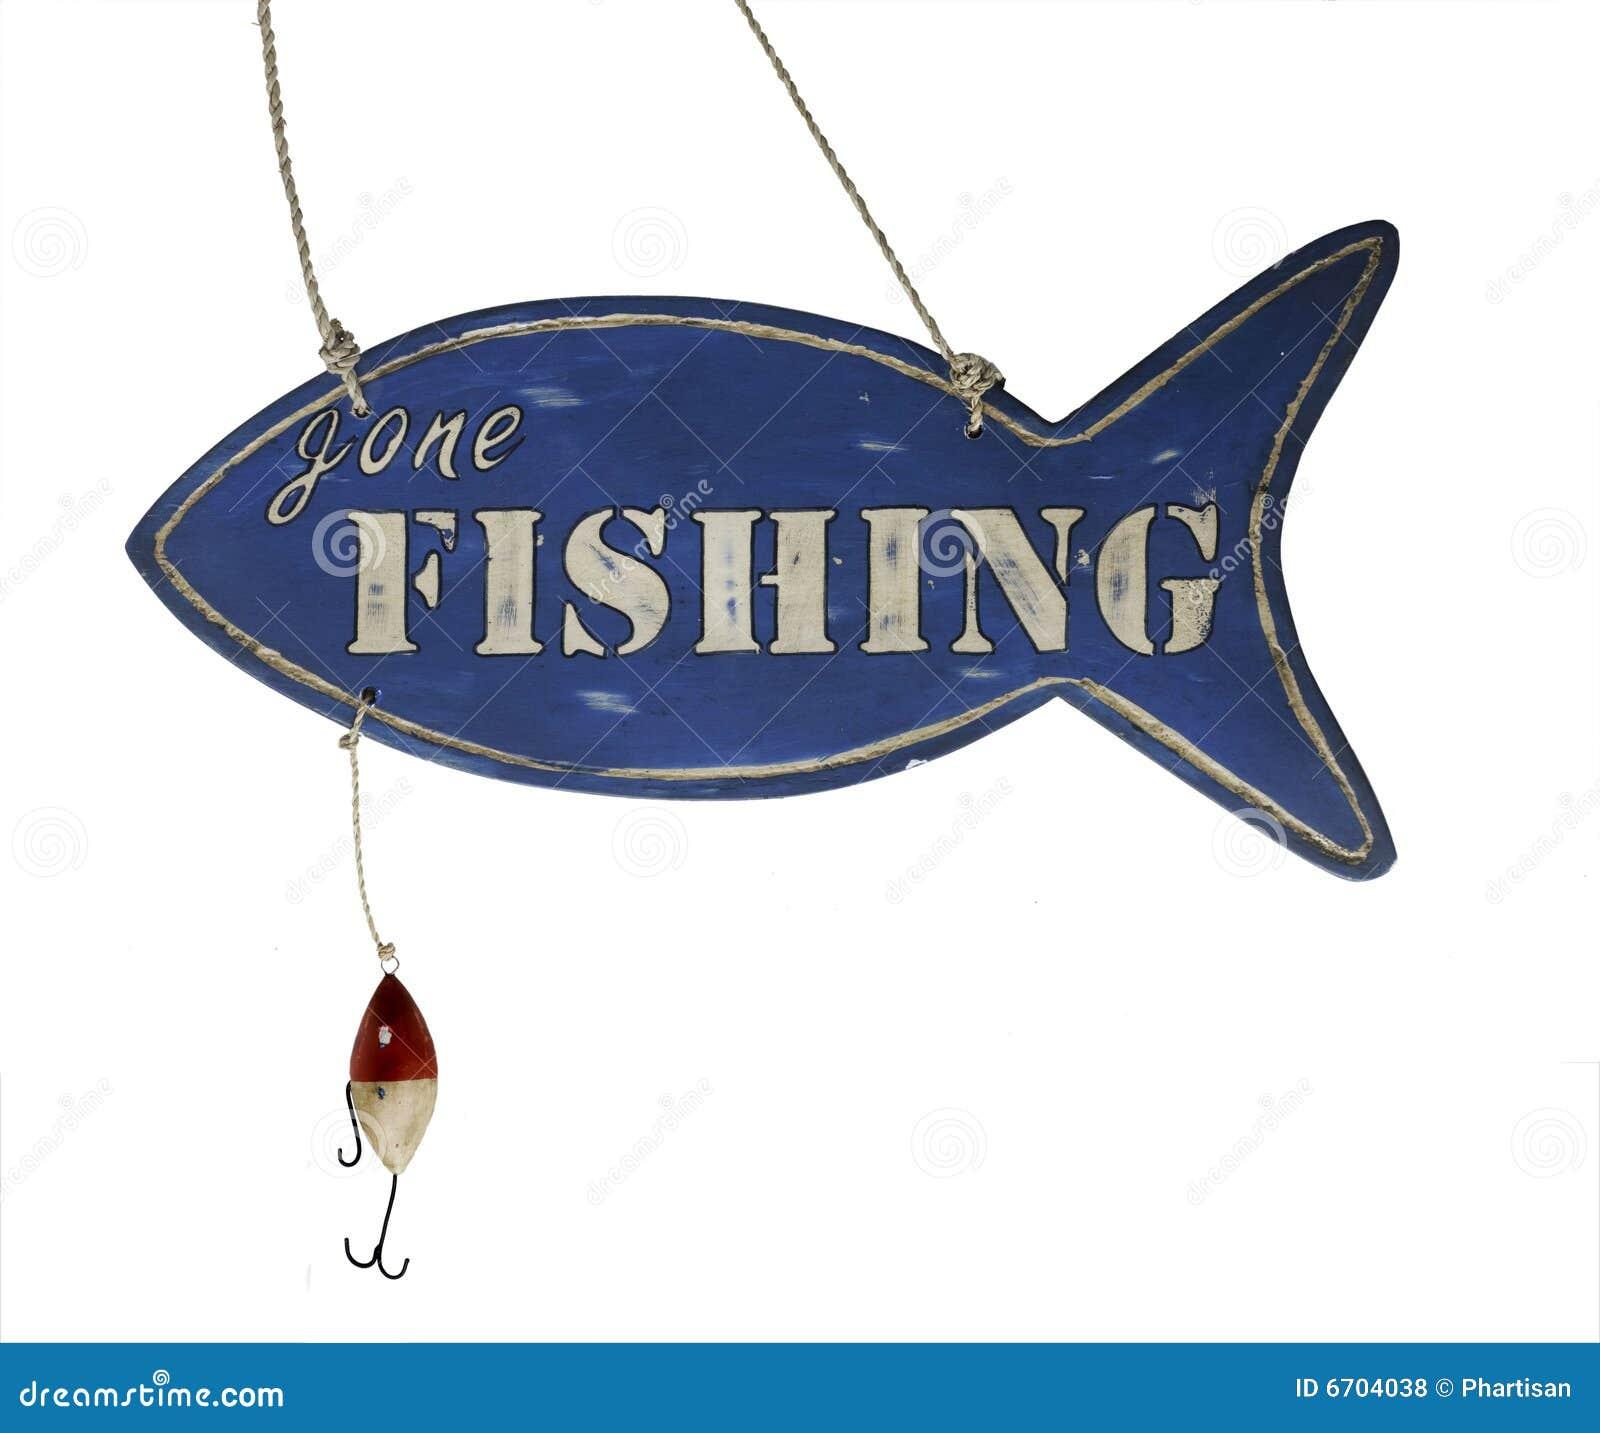 gone fishing sign clip art